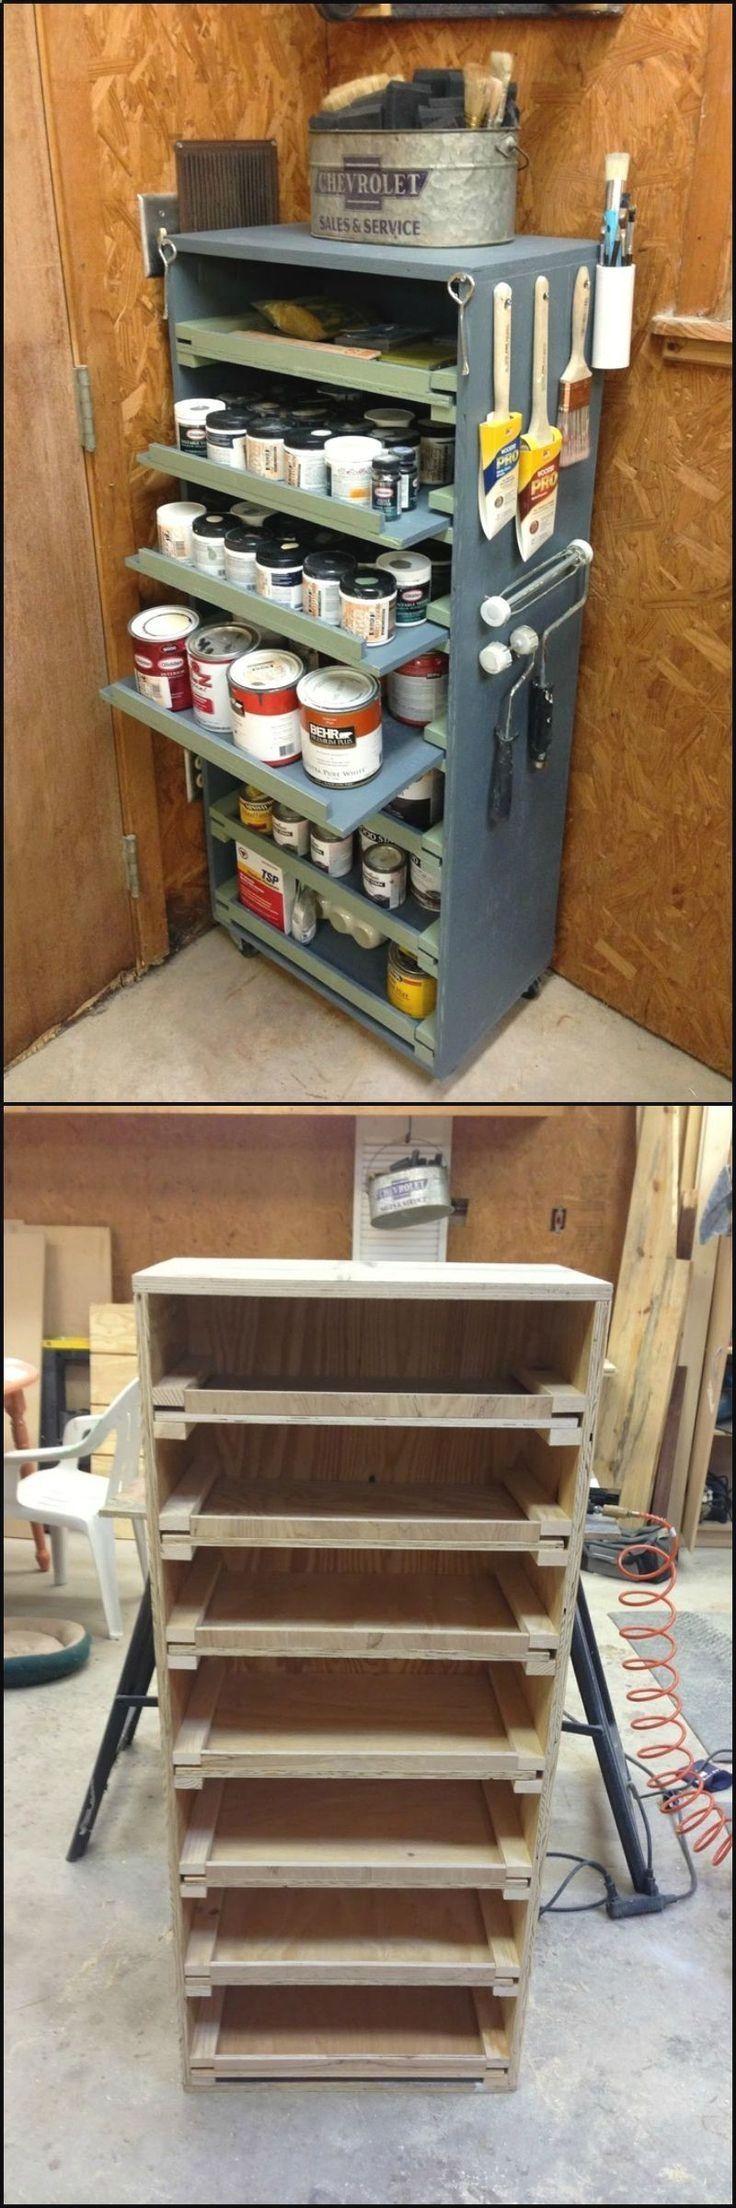 Garage Wall Organization Kit and Pics of Garage Storage